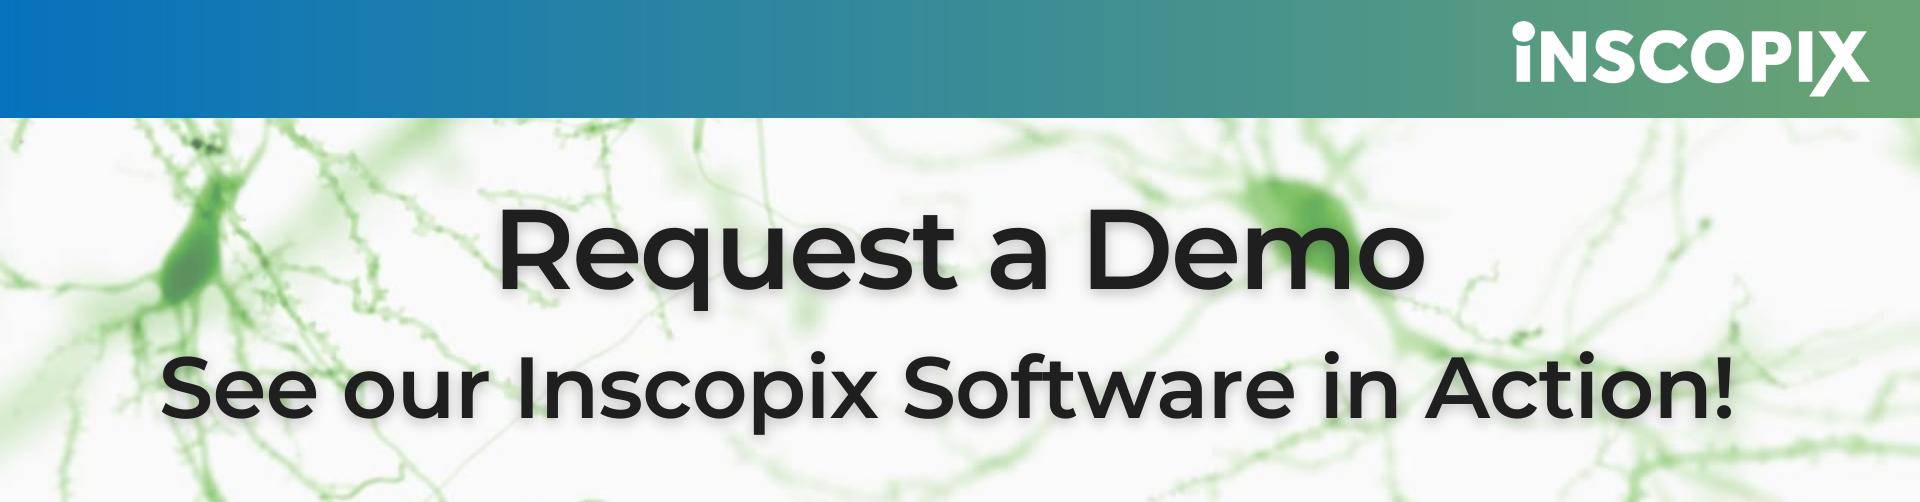 INS Software Website_Request a Demo BANNER